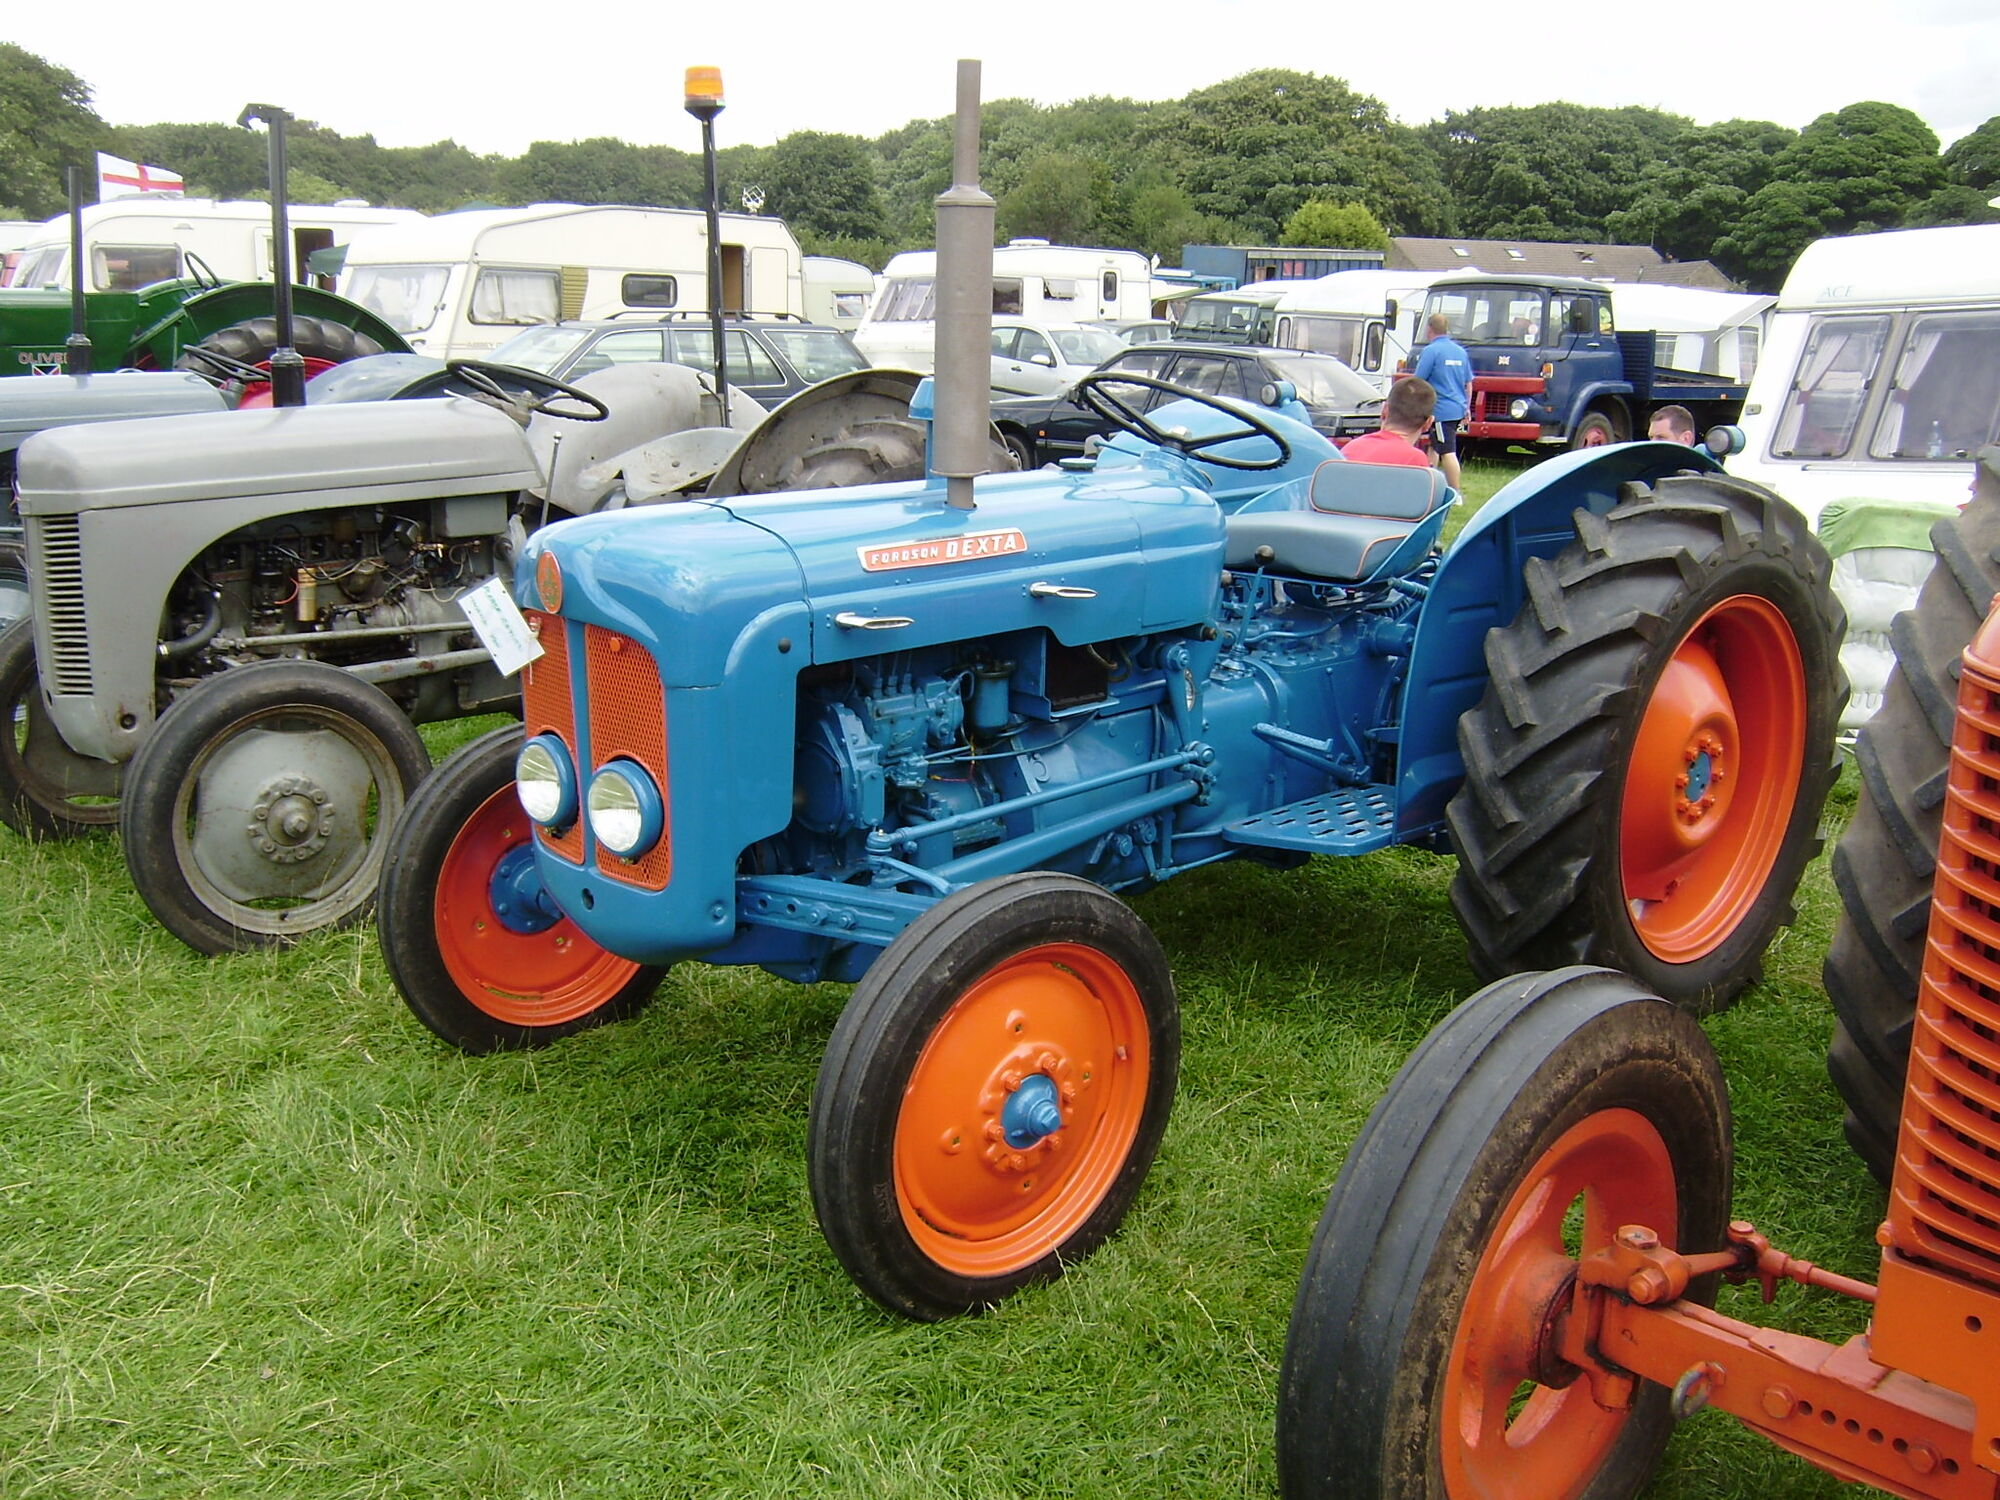 1958 Ferguson Tractor Attachments : Fordson dexta tractor construction plant wiki fandom